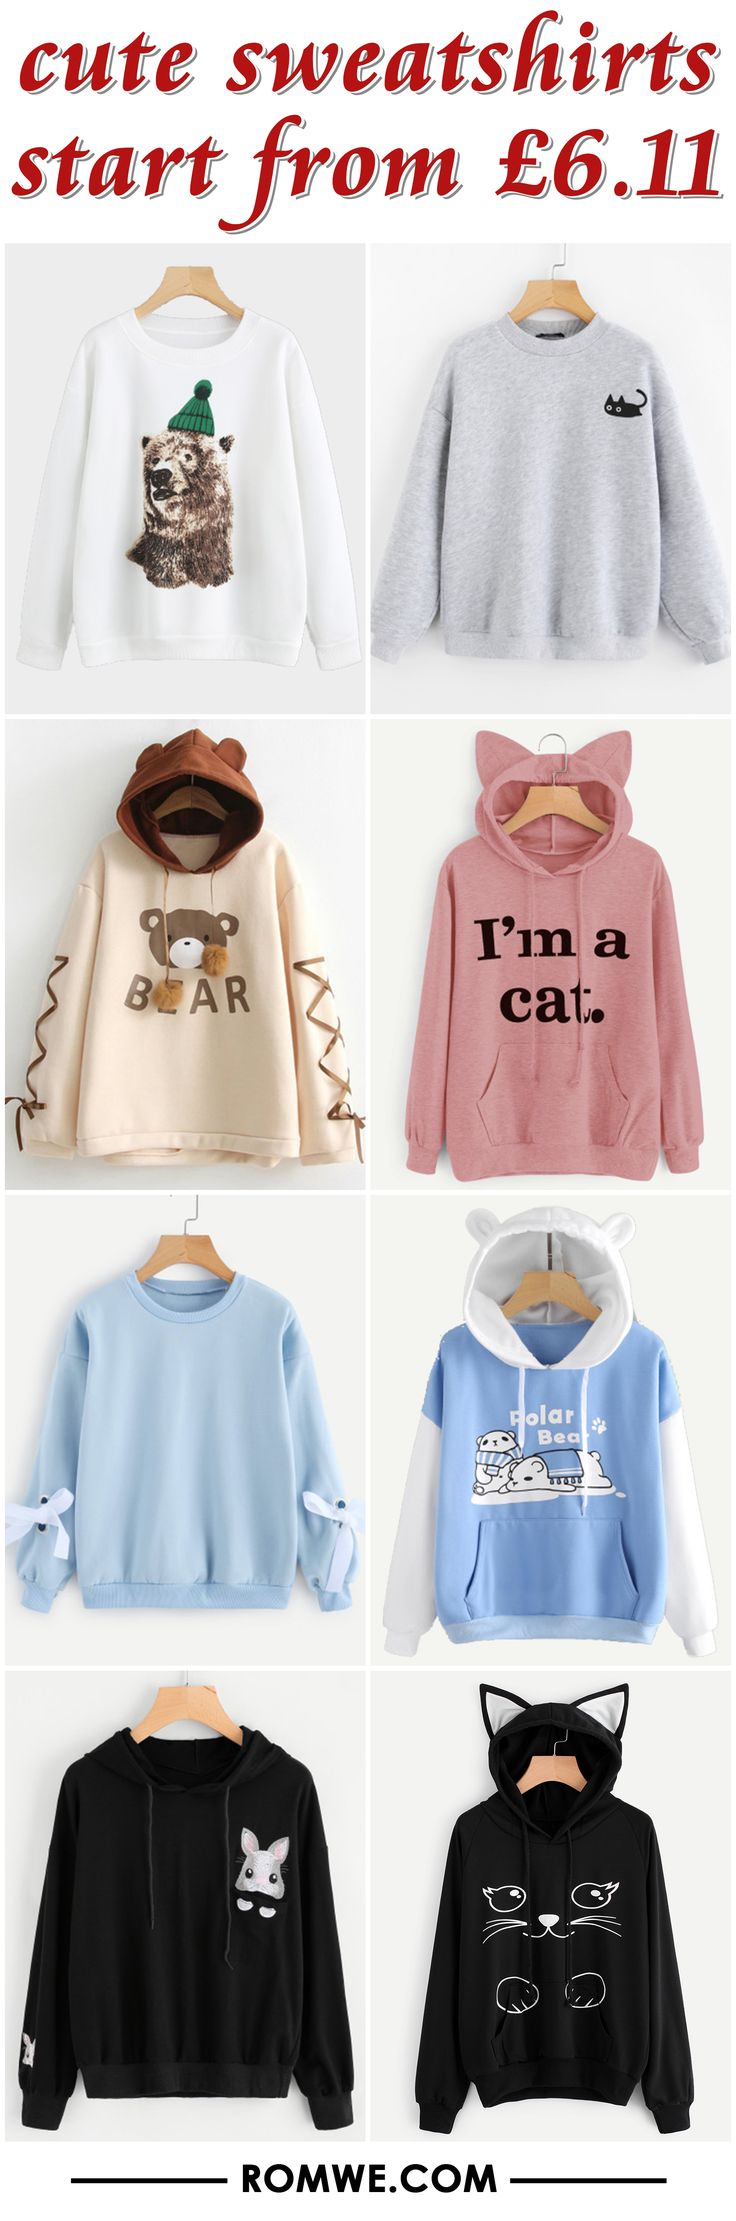 cute sweatshirts from £6.11